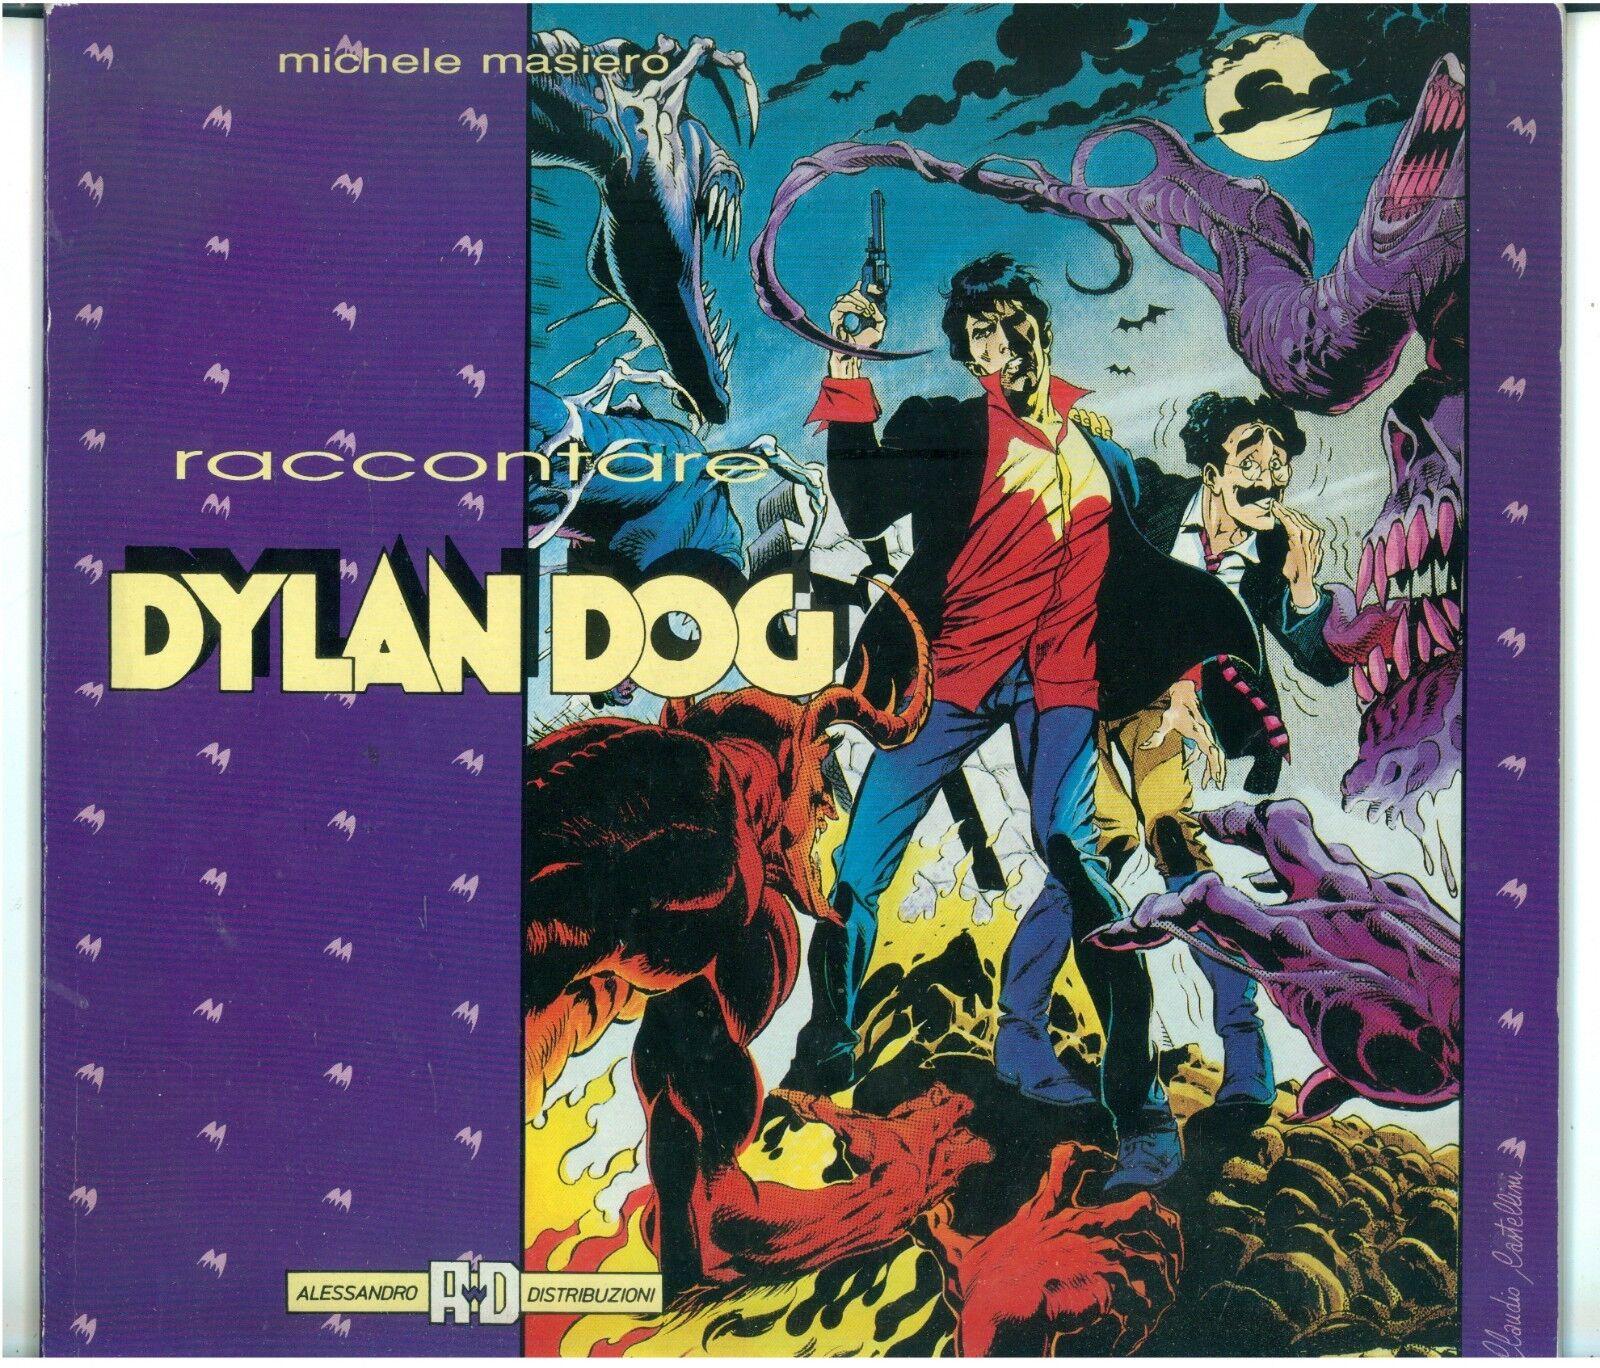 MASIERO MICHELE RACCONTARE DYLAN DOG ALESSANDRO DISTRIBUZIONI 1990